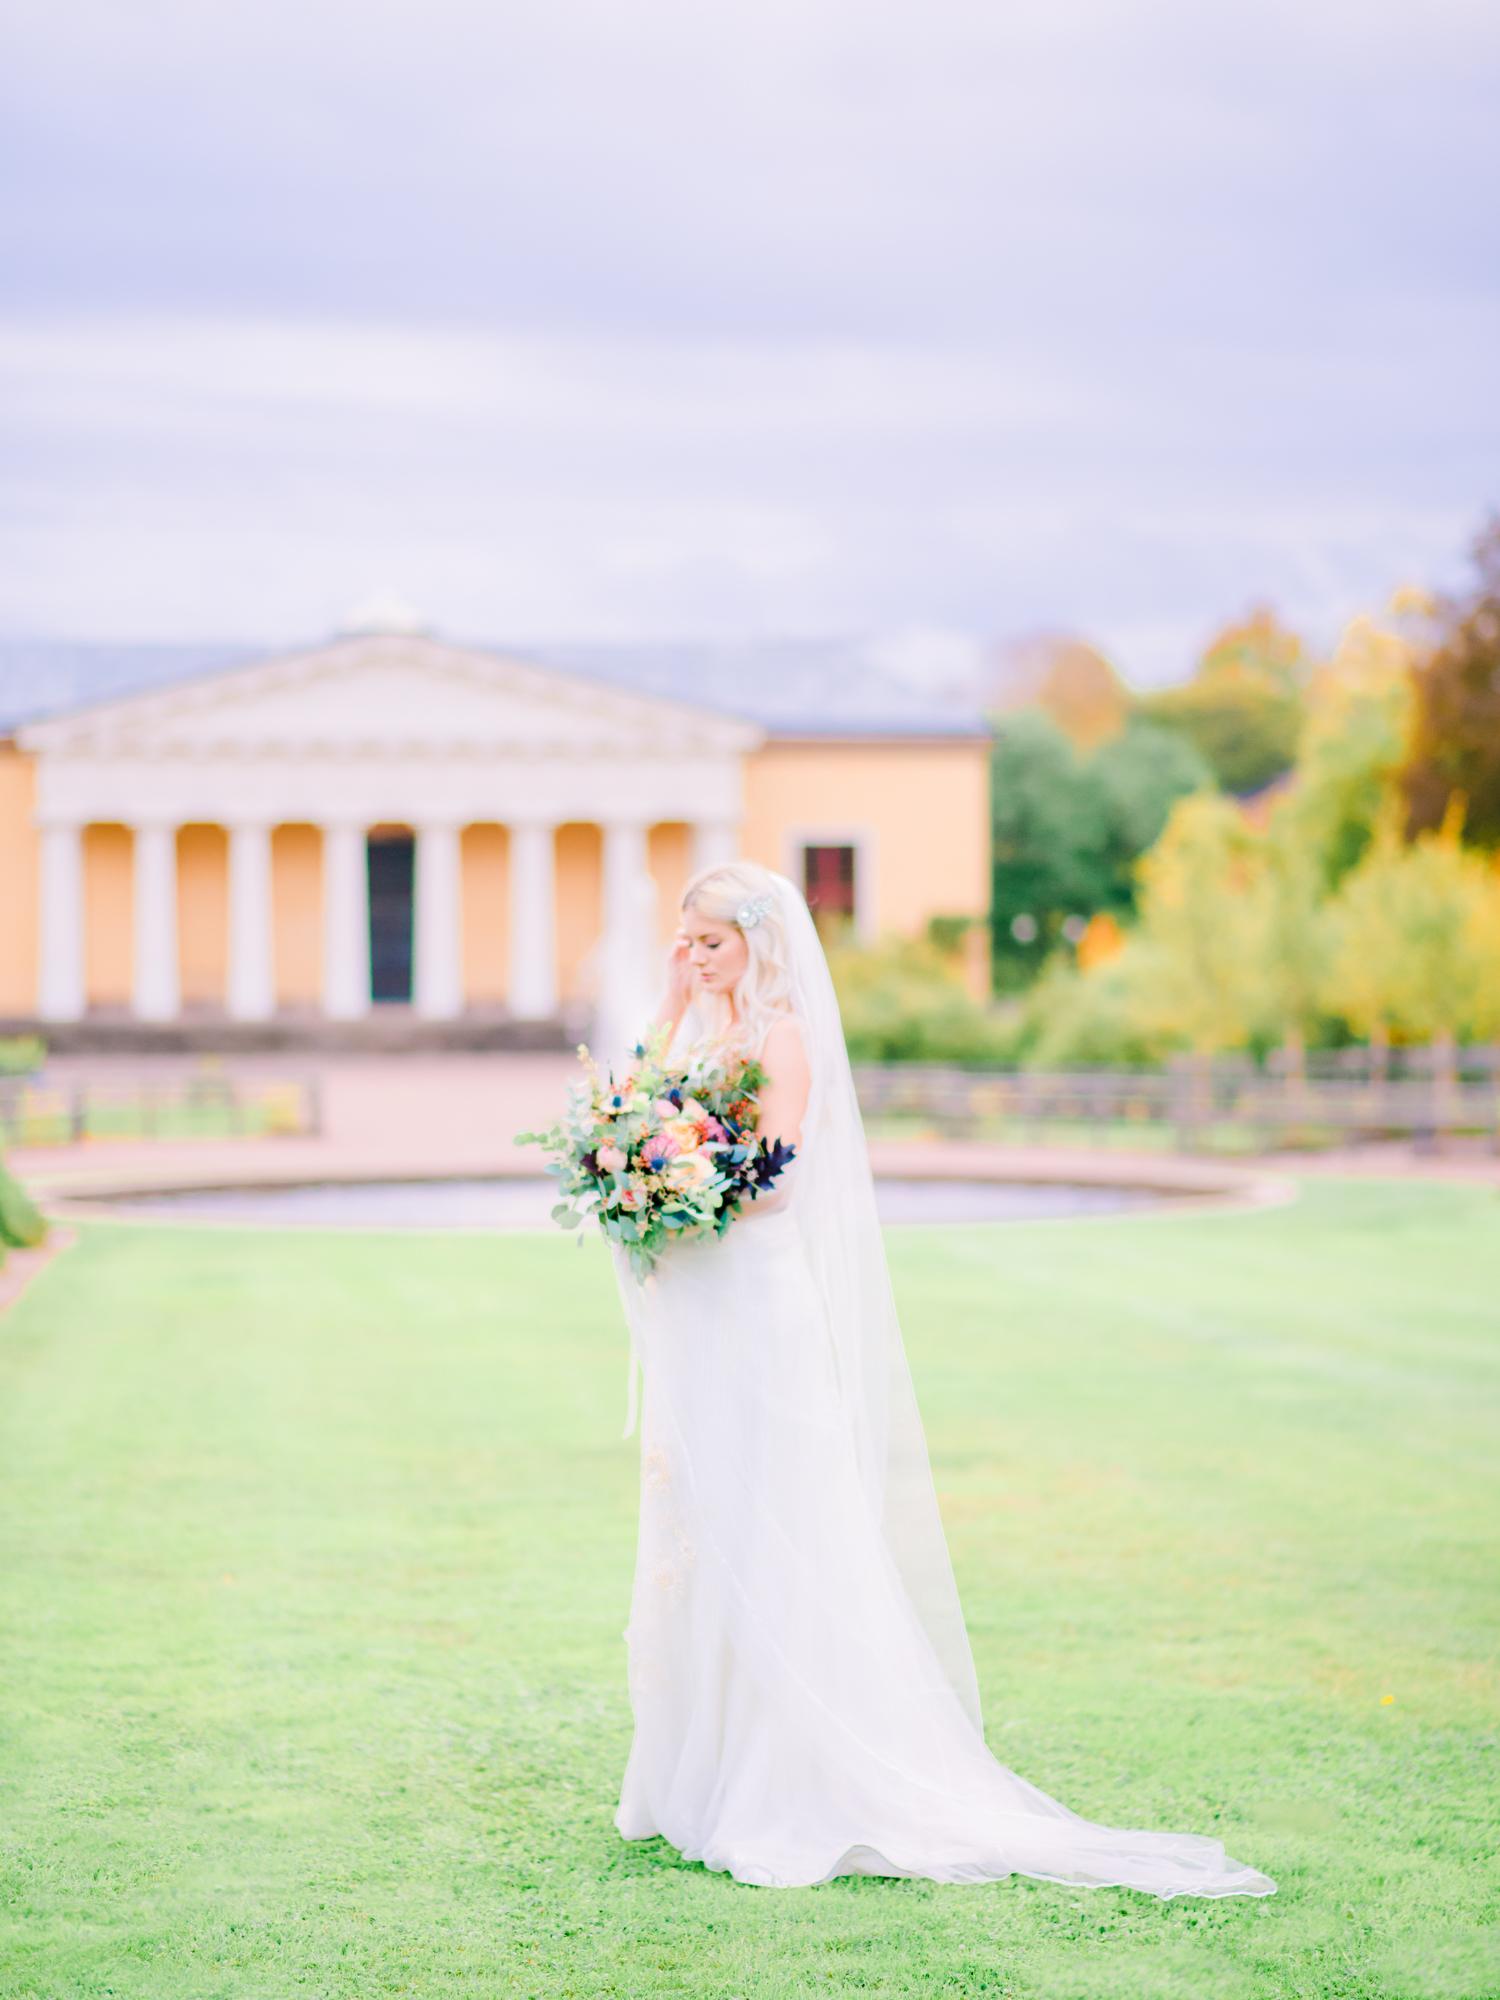 Elegant Organic Fall Swedish Bridal Wedding Styled Shoot - Erika Alvarenga Photography-1.jpg